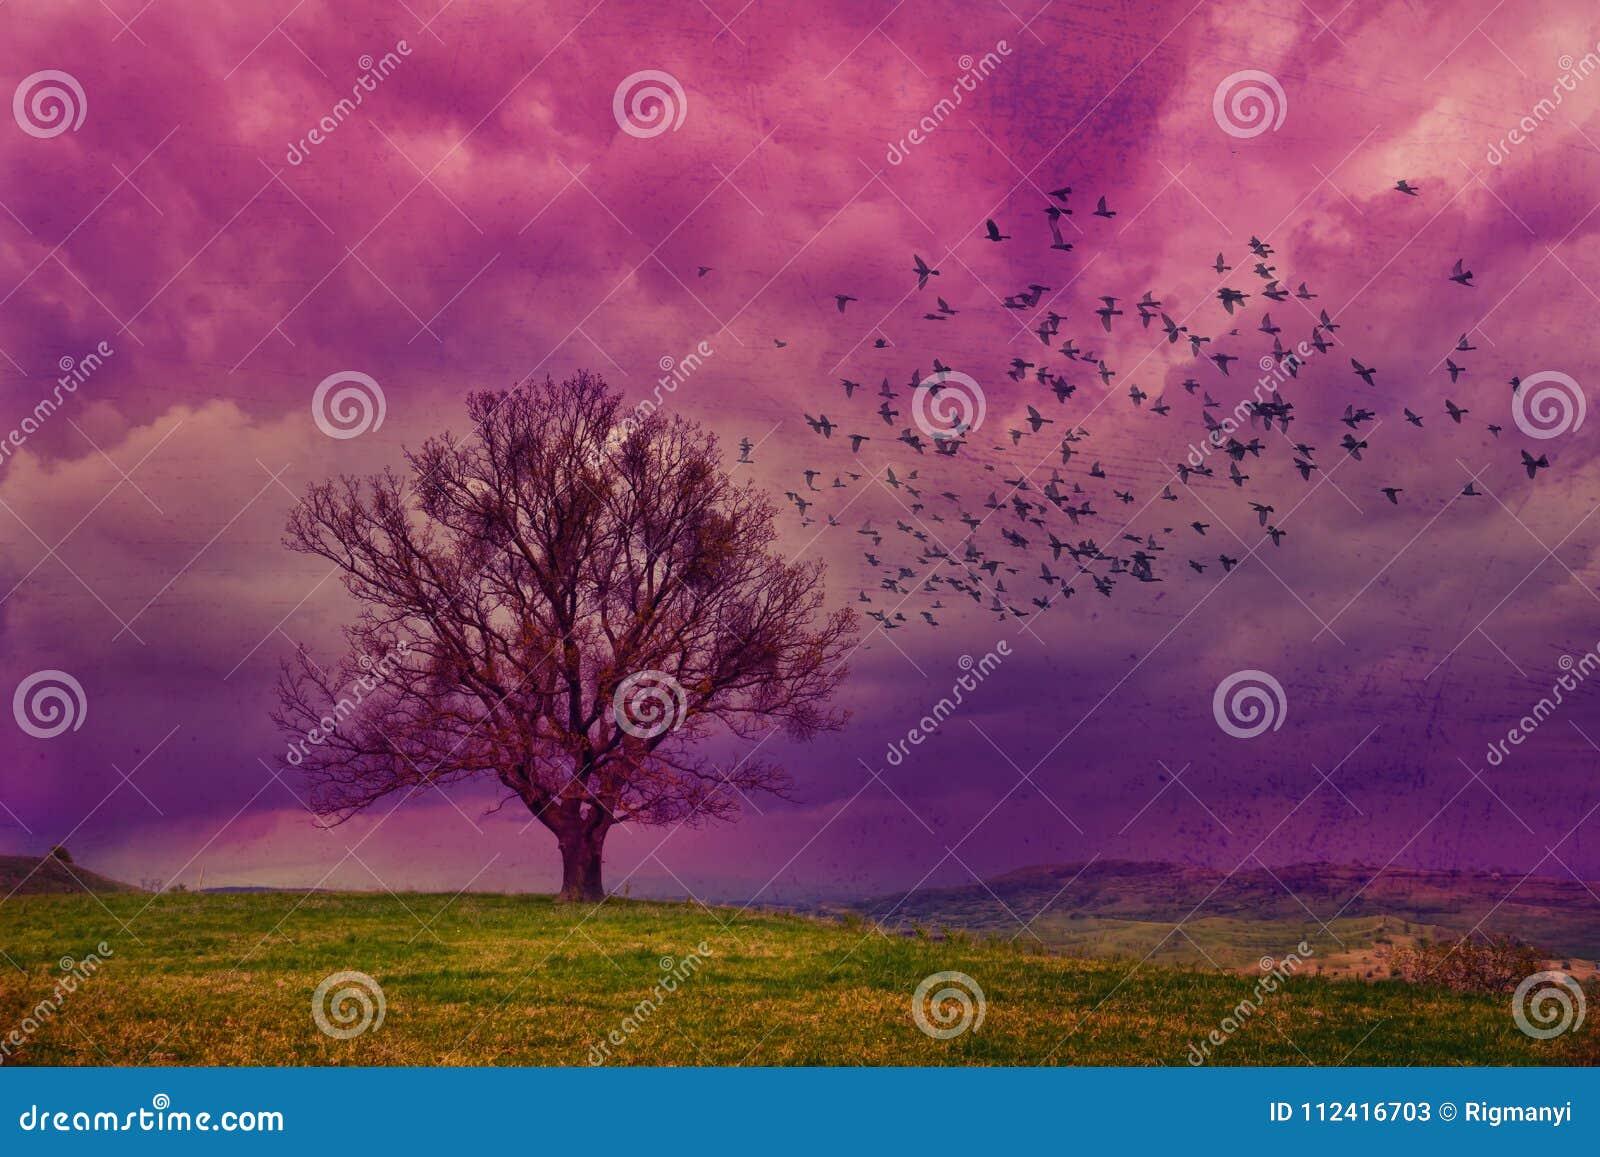 Violette fantasie